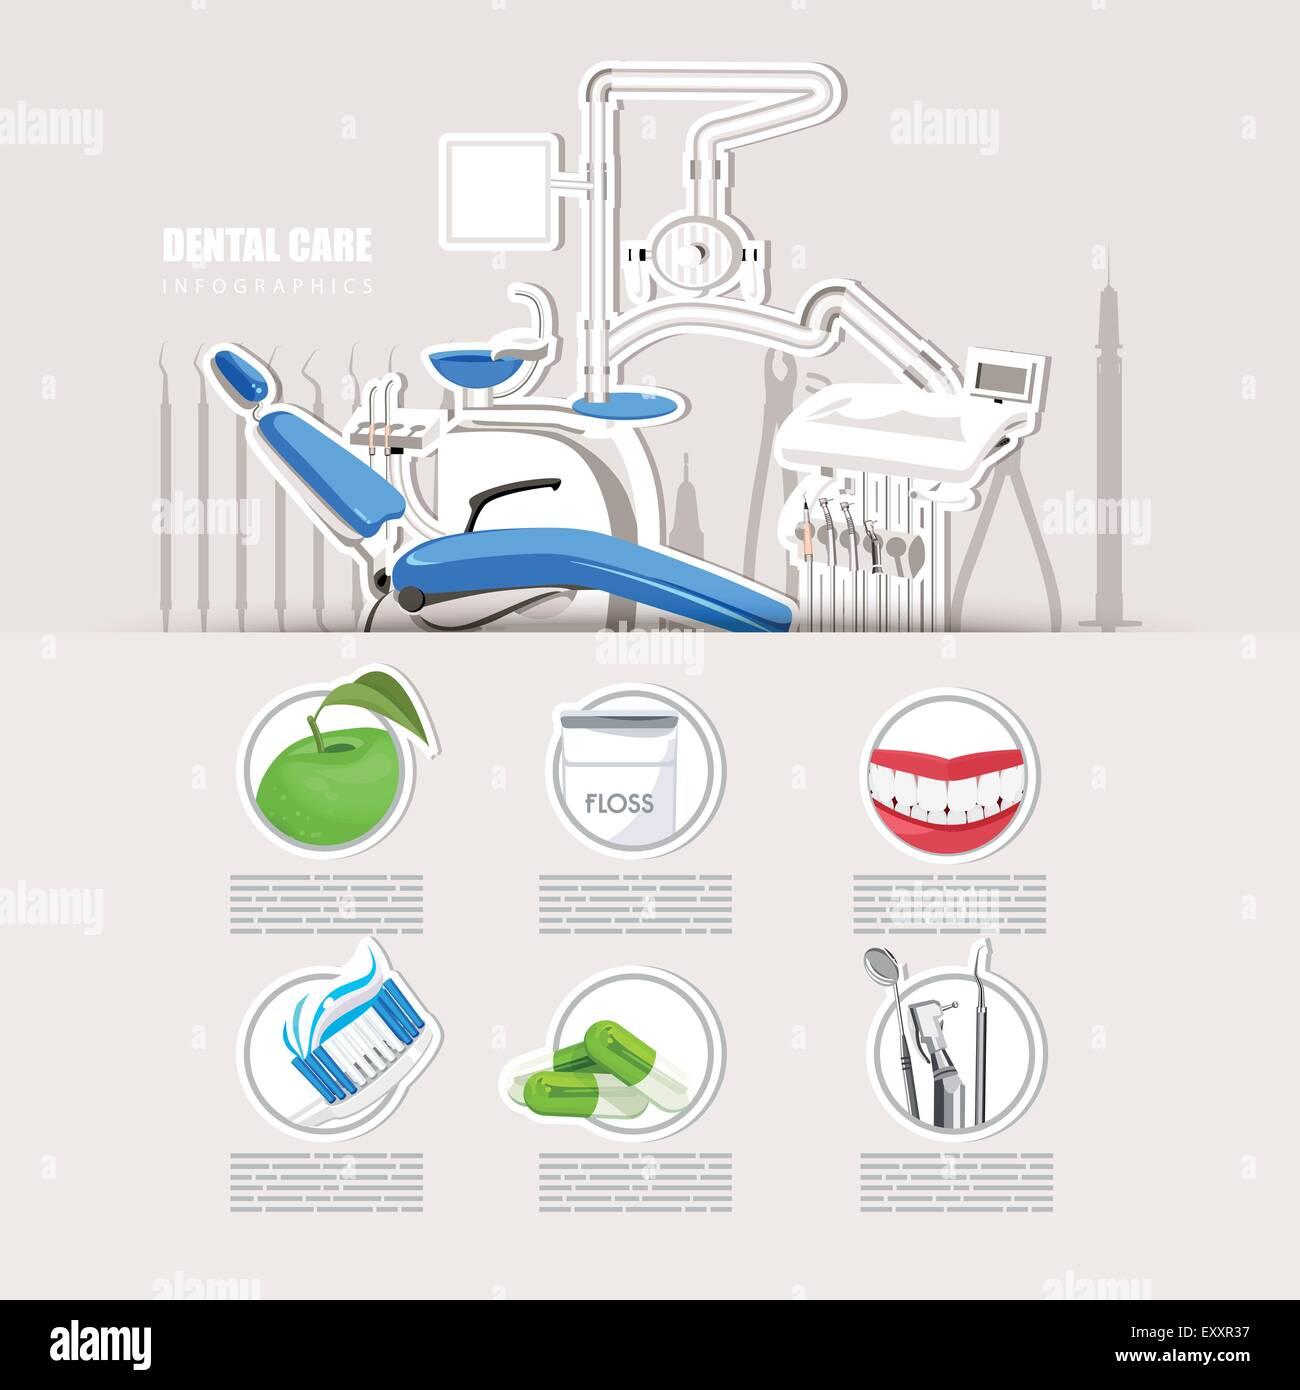 dentistry-infographics-dental-care-denta